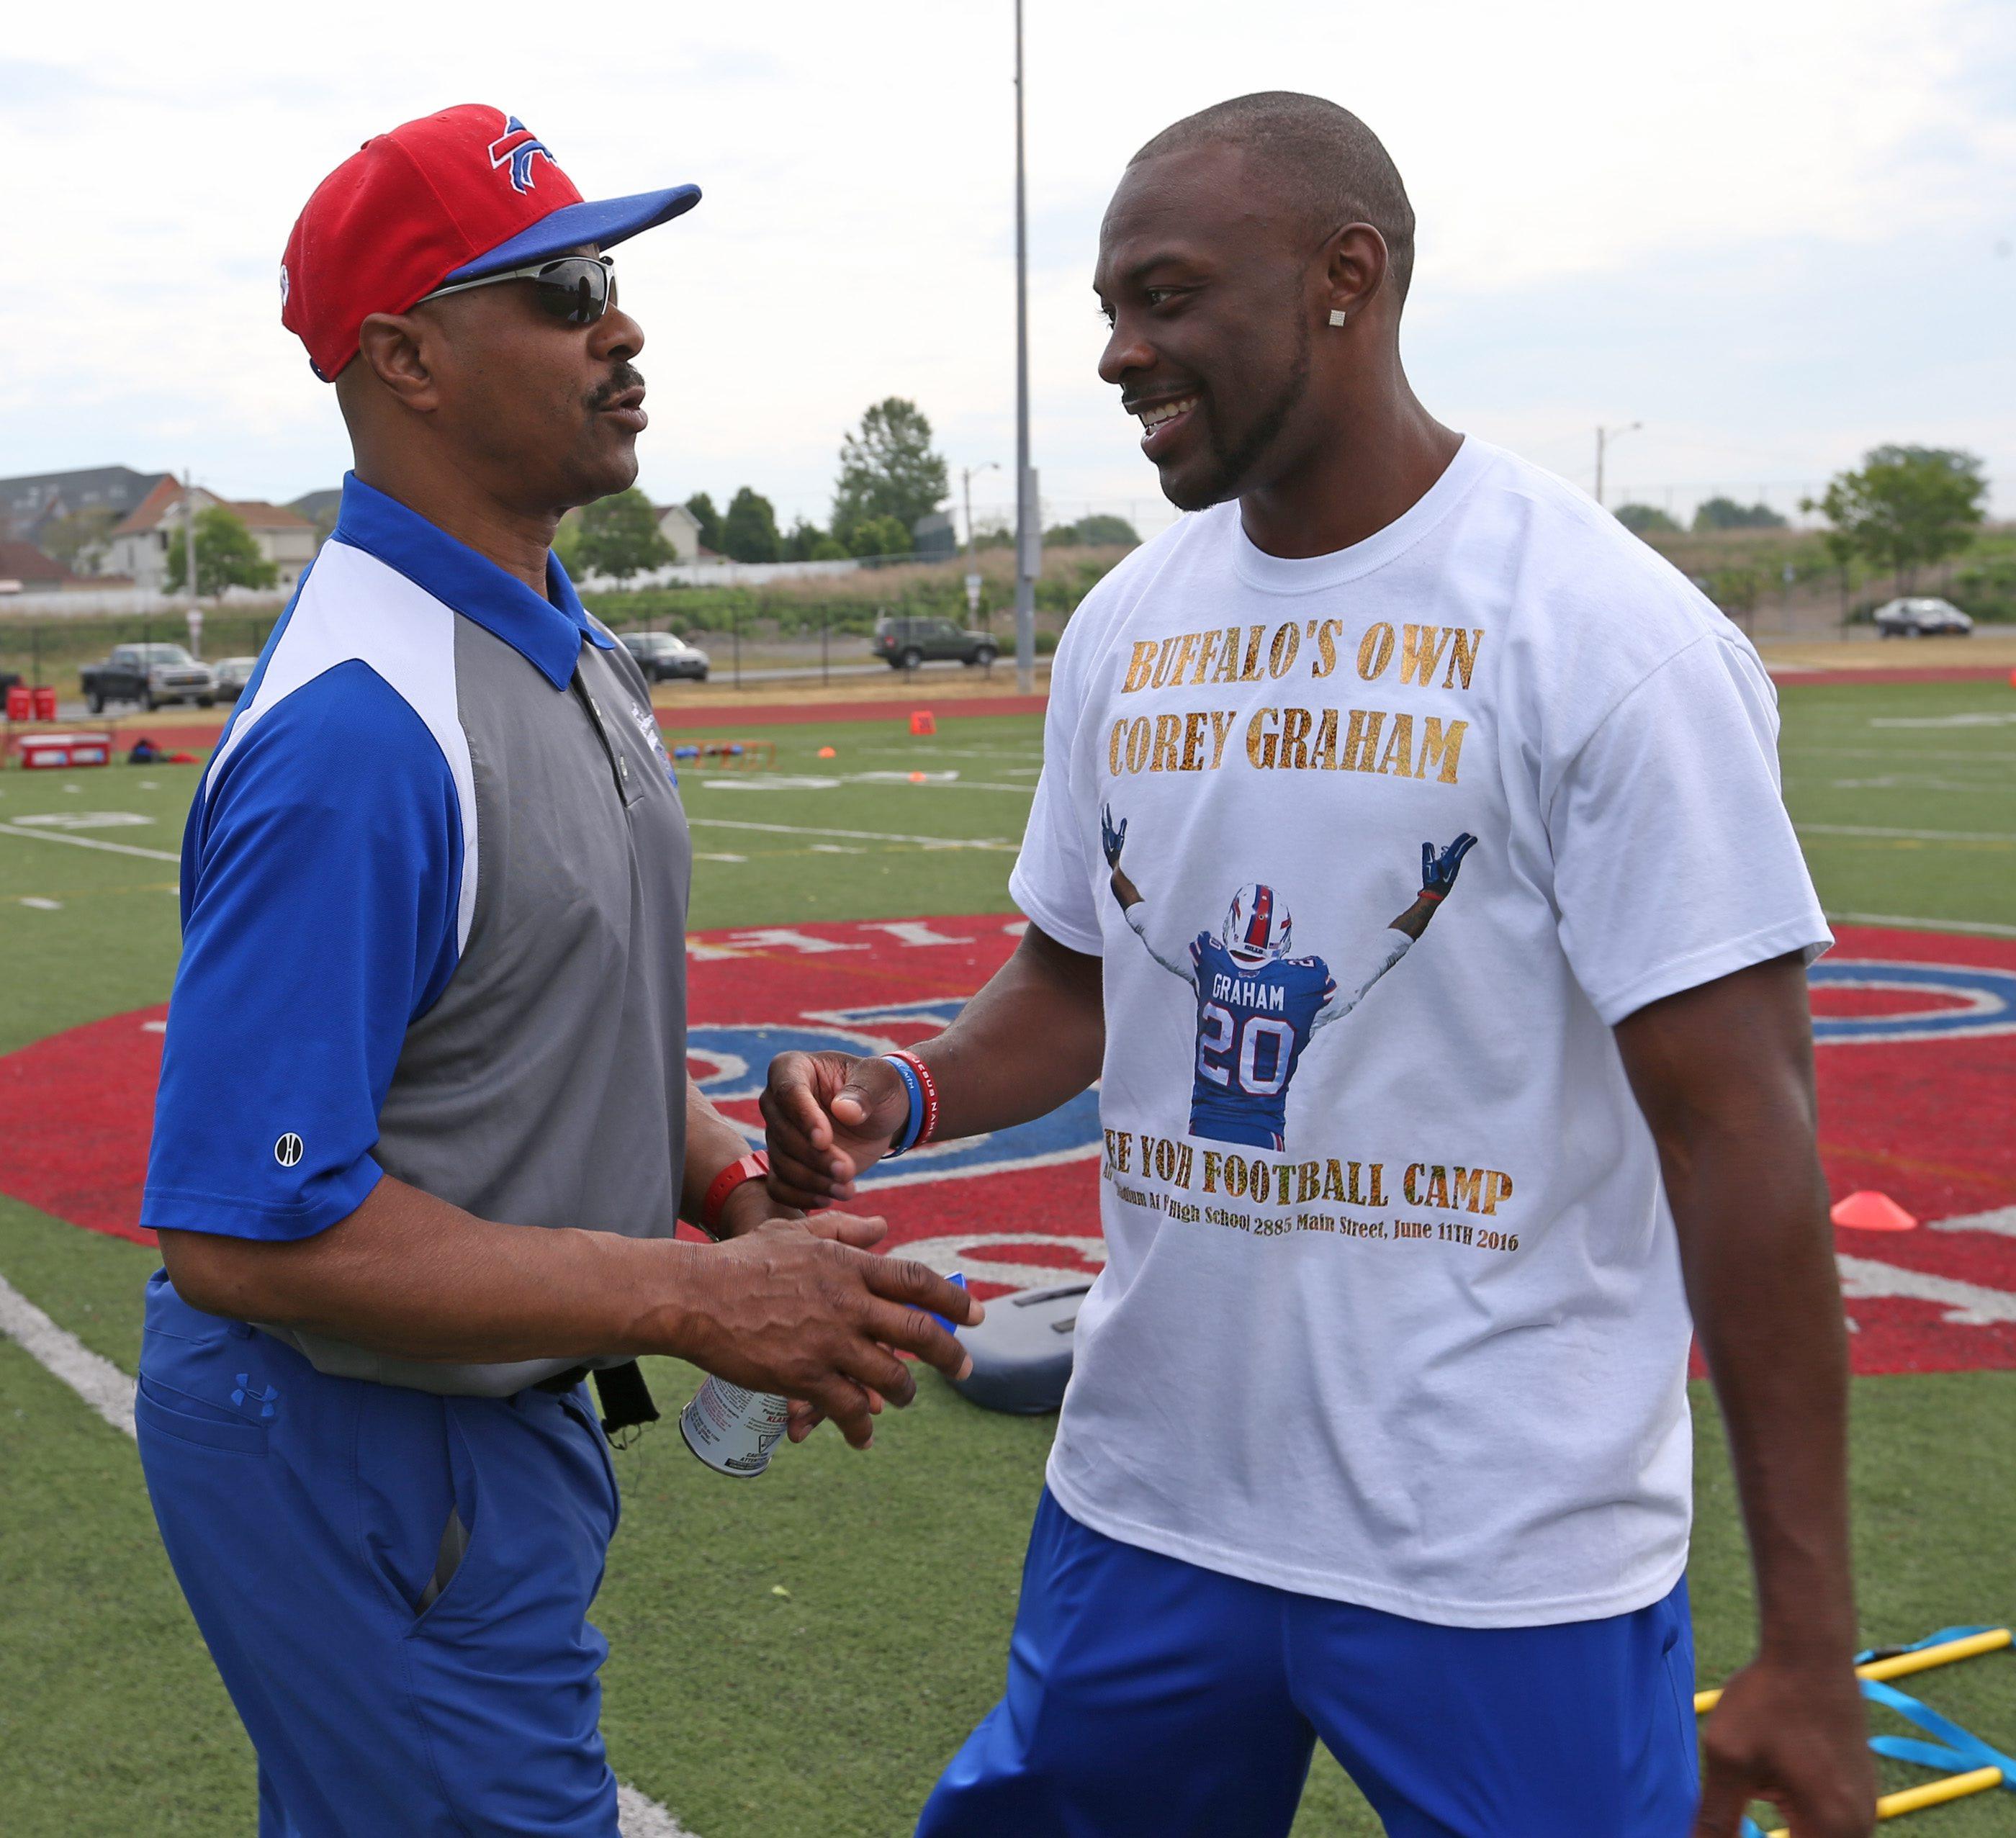 Corey Graham runs a free football camp along with his high school coach Willie Burnett at Robert E Rich Sr. All High Stadium in Buffalo, NY on Saturday,June 11, 2016.  (James P. McCoy/ Buffalo News)